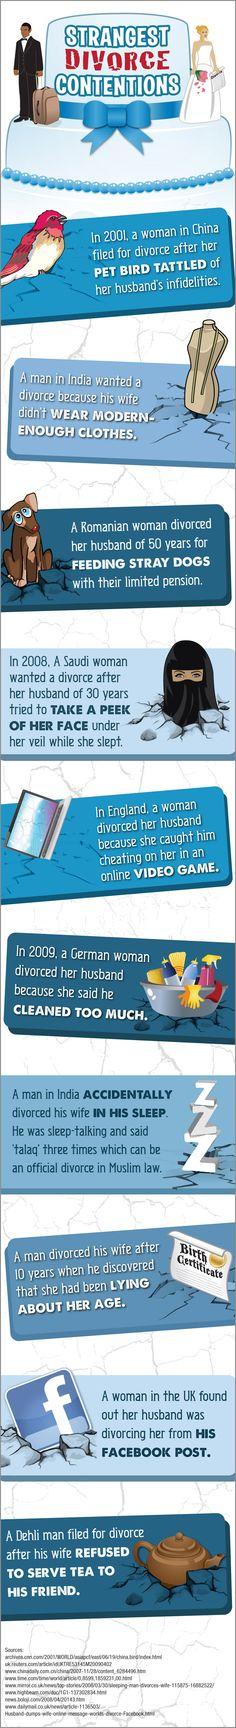 Strangest Divorce Contentions